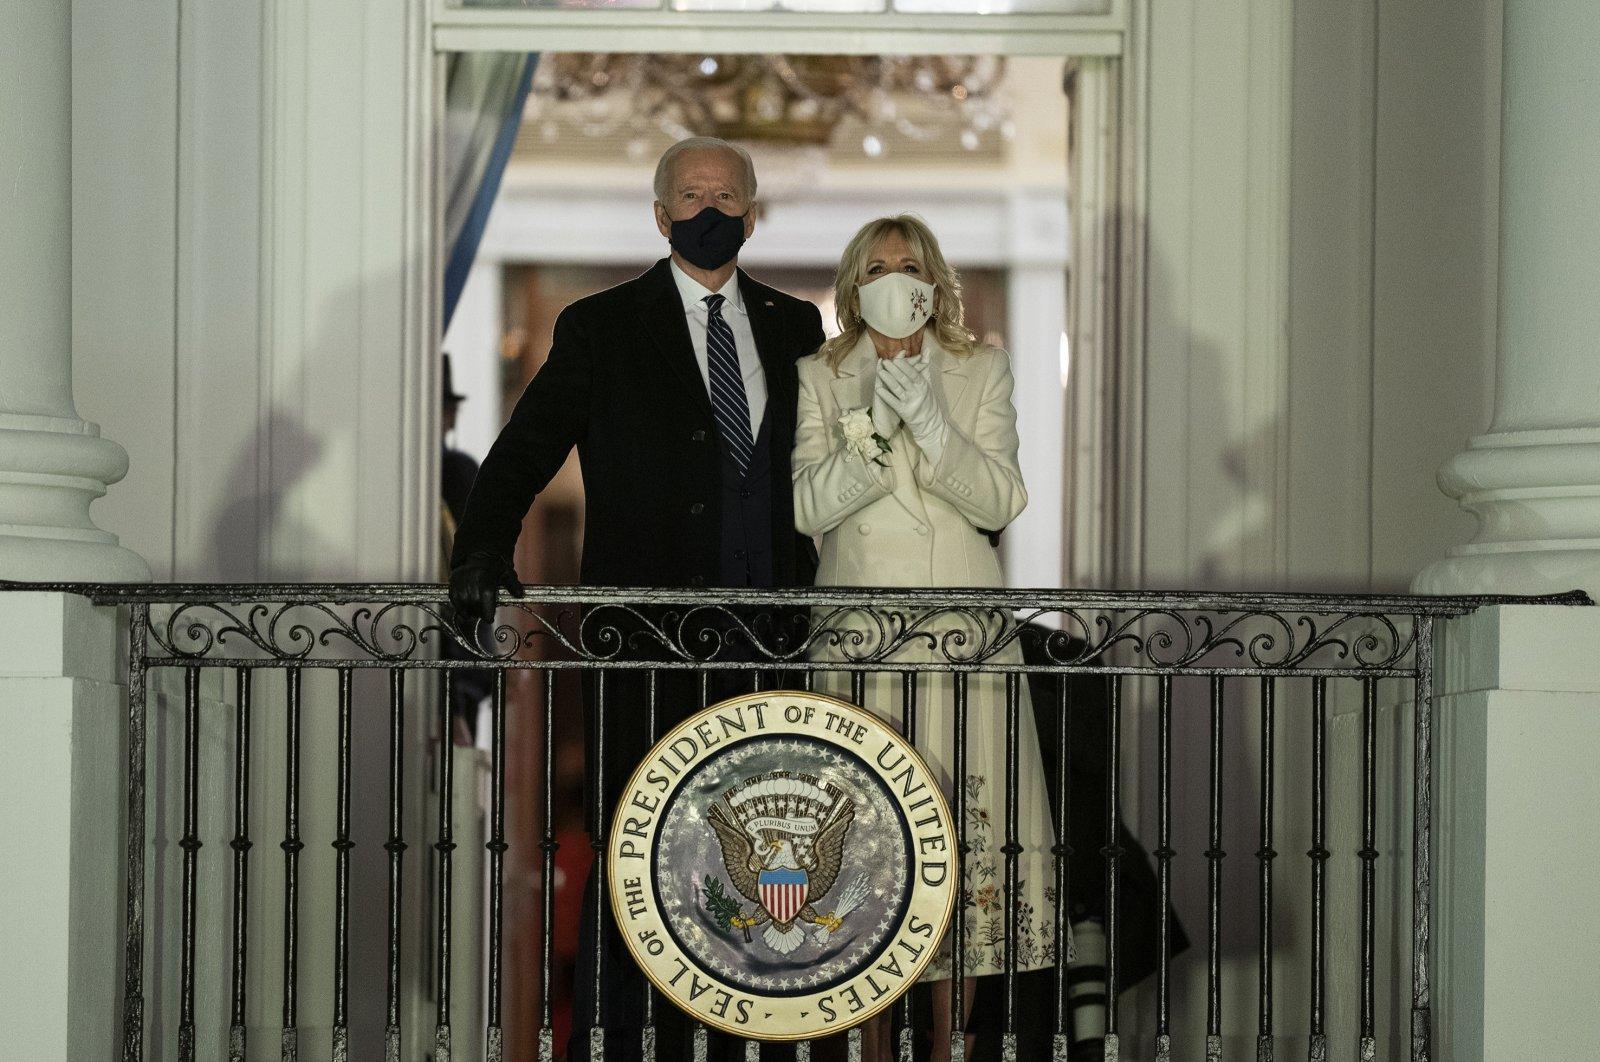 U.S. President Joe Biden and first lady Jill Biden watch fireworks from the White House, Washington, D.C., U.S., Jan. 20, 2021. (AP Photo)